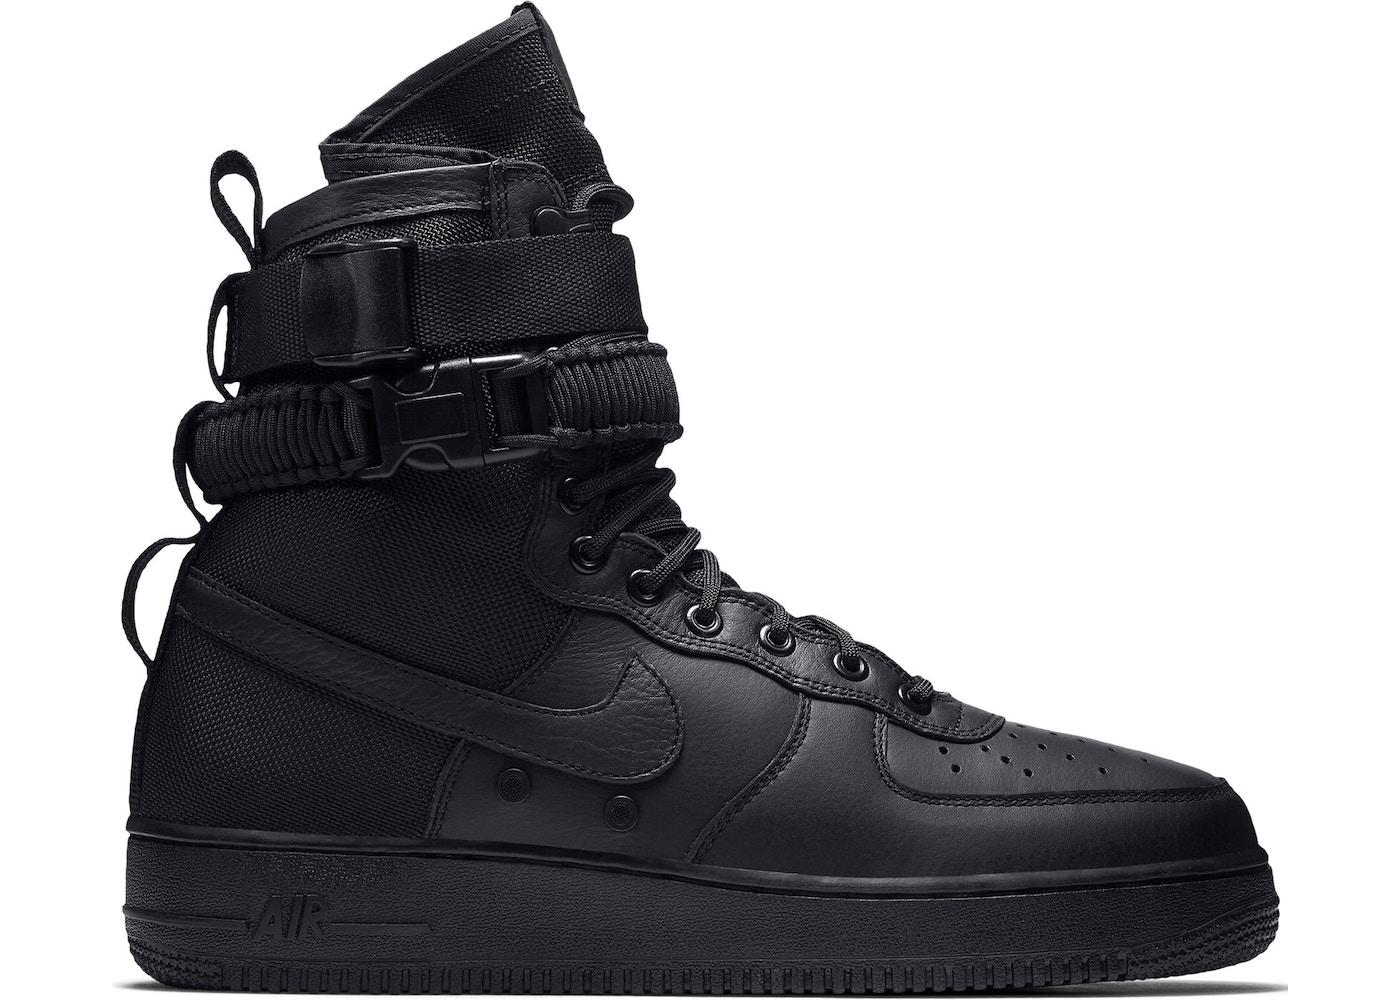 on sale 49a80 f723c nike air force 1 all black high